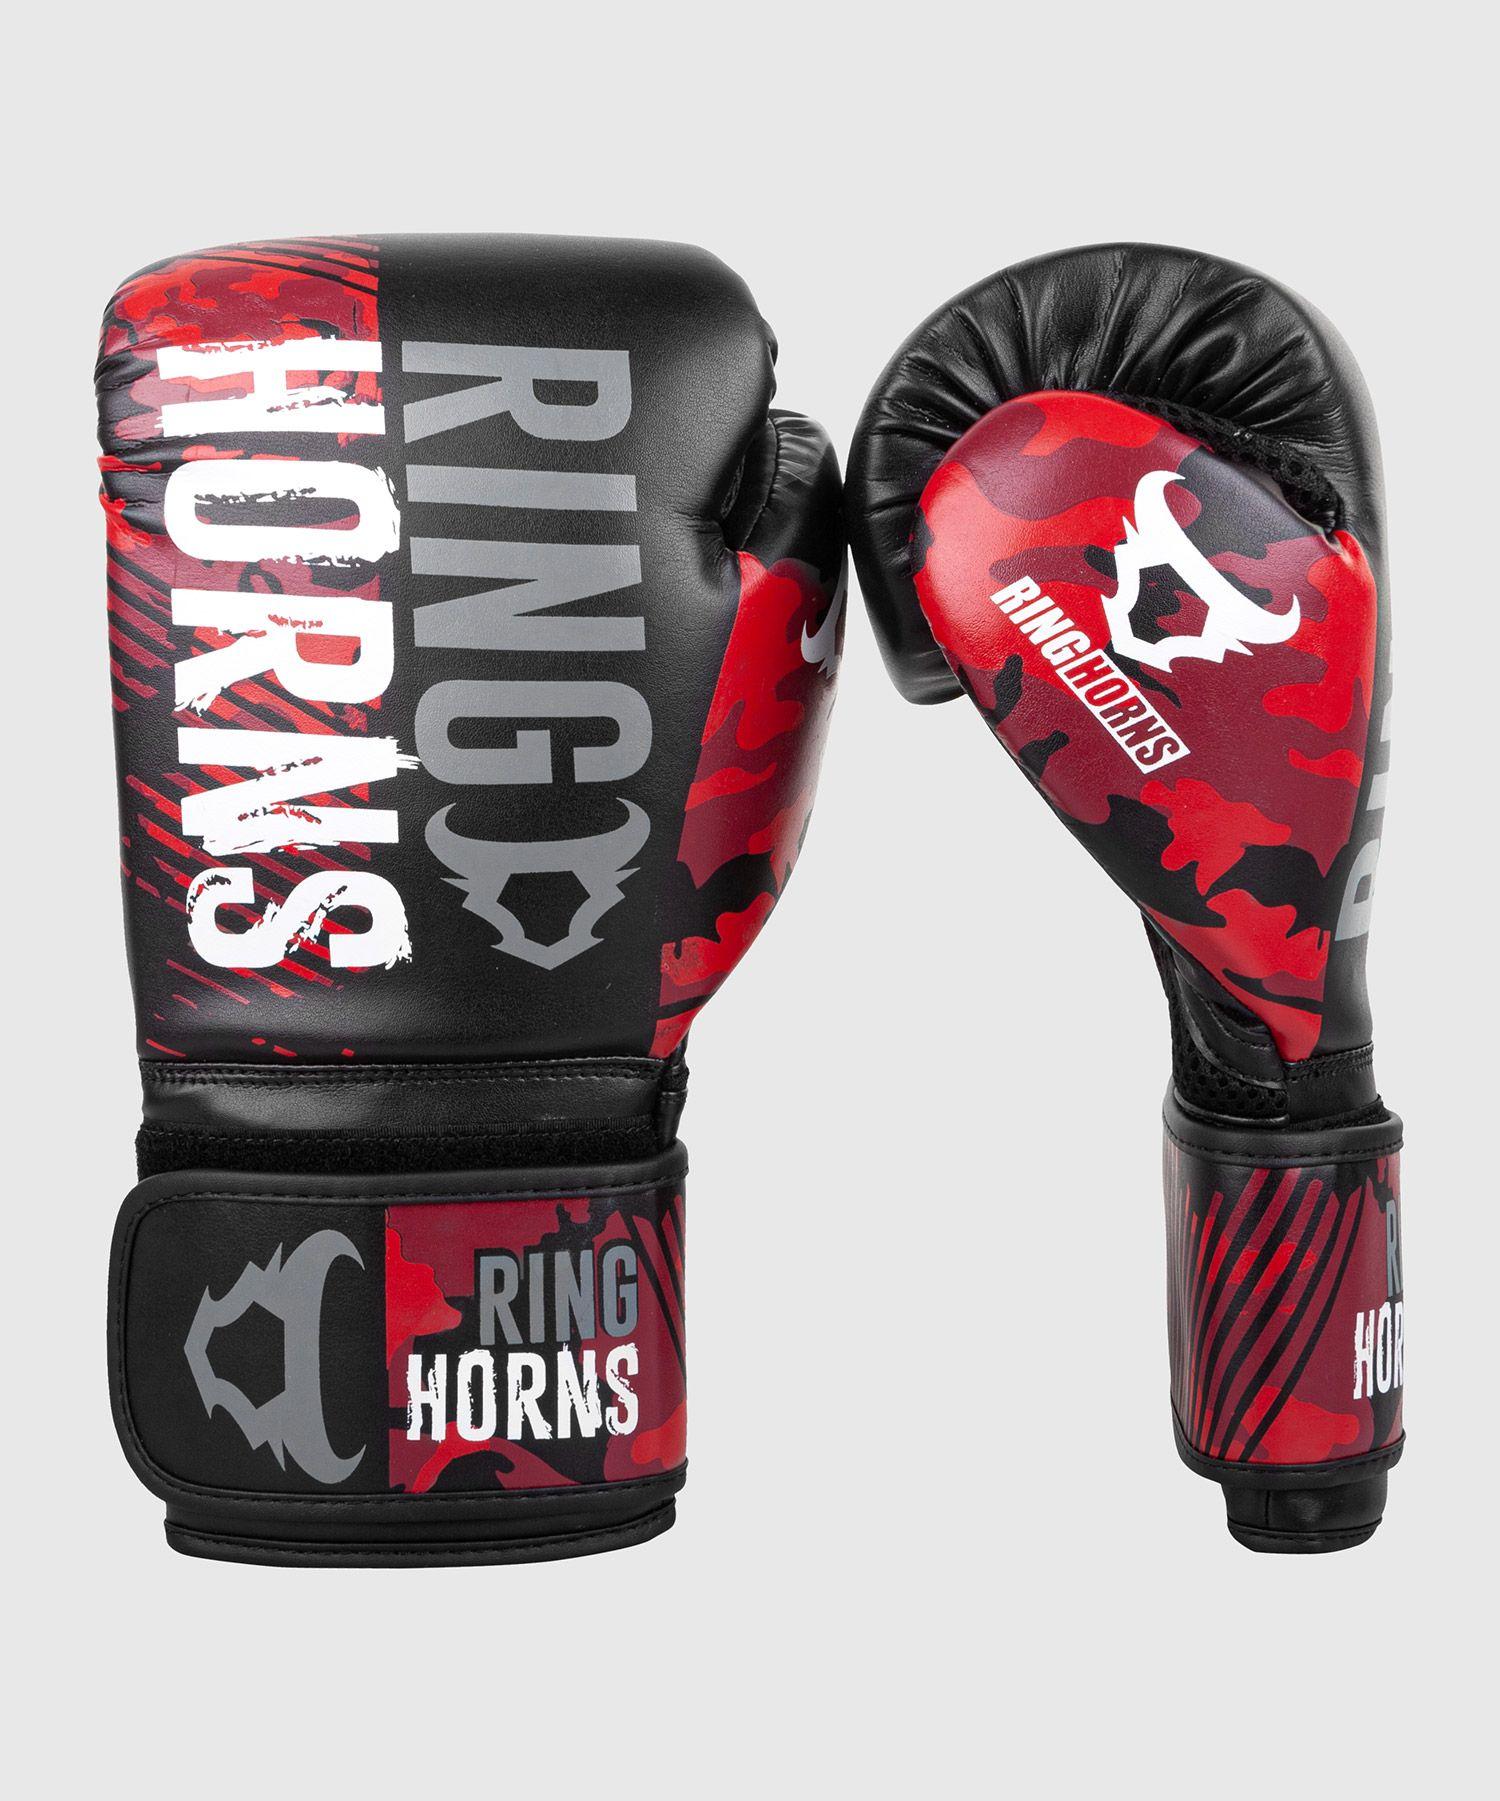 Guantes de boxeo Ringhorns Charger Camo - Negro/Rojo